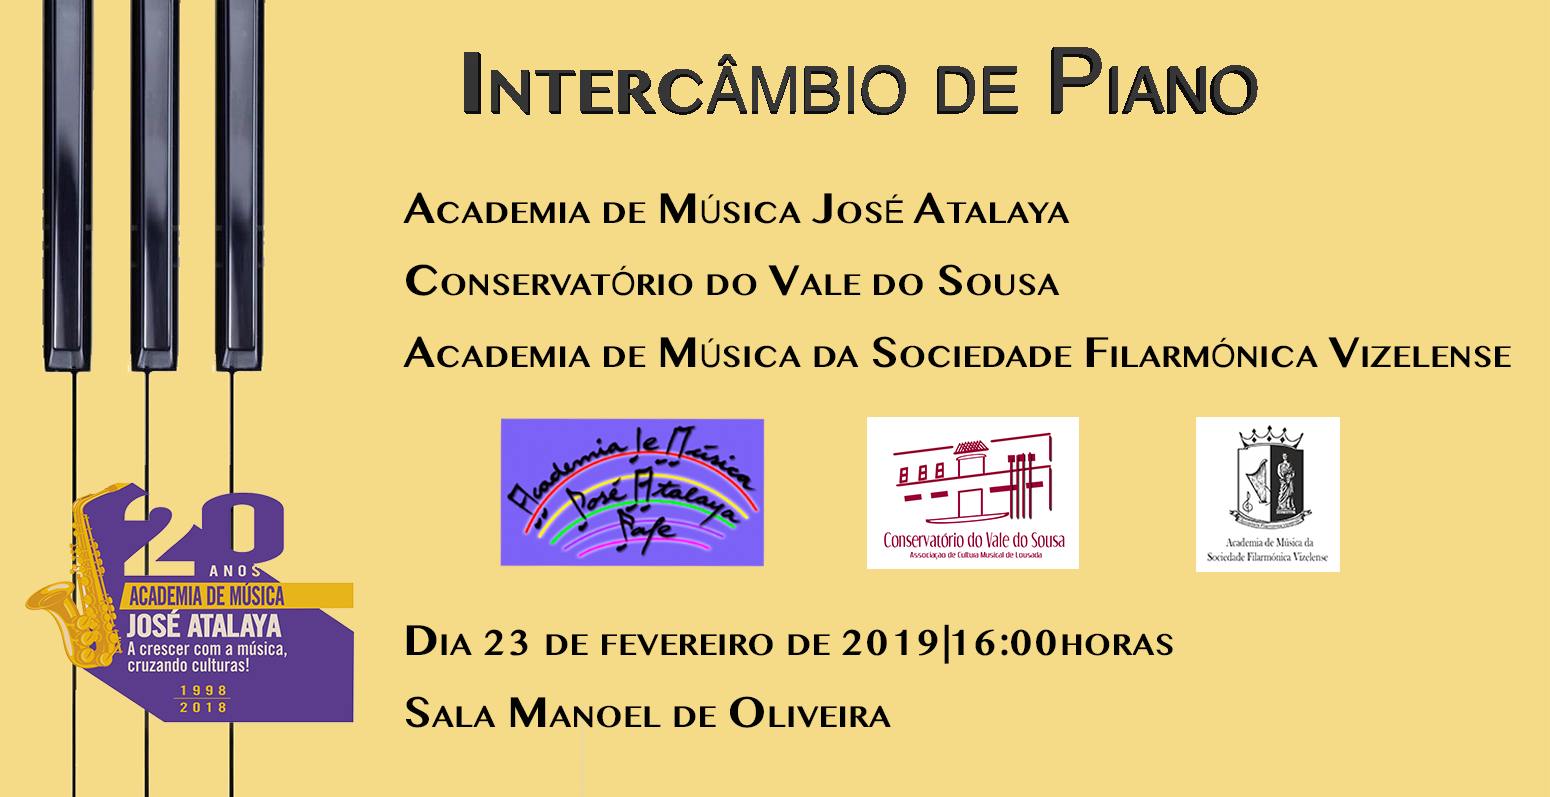 Intercâmbio de Piano Academia de Música José Atalaya|Conservatório do Vale do Sousa|Academia de Música da Sociedade Filarmónica Vizelense  Realiza-se na Sala Manoel de Oliveira no próximo dia 23 de fevereiro, pelas 16:00h.